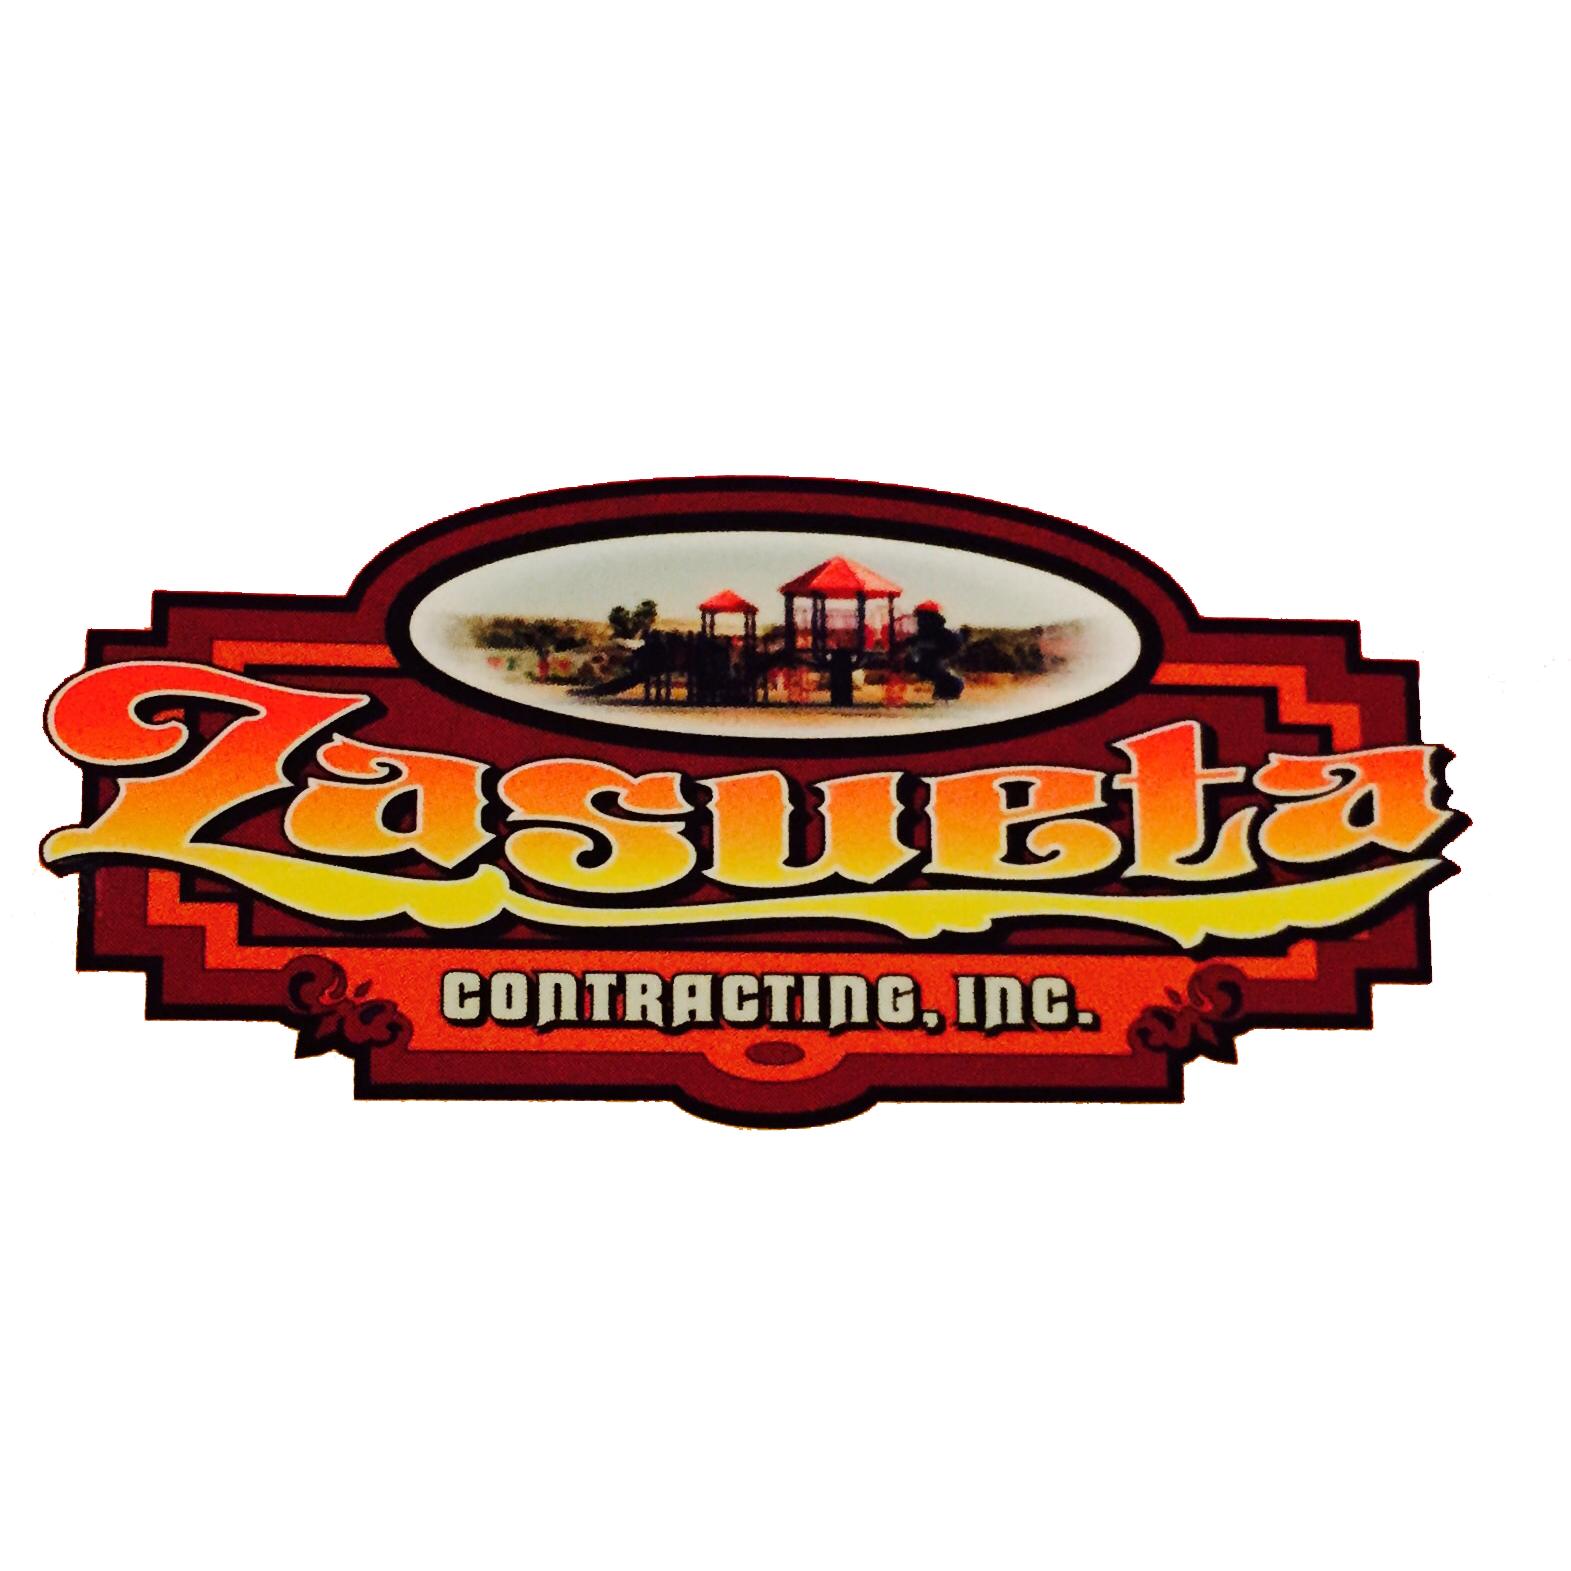 Zasueta Contracting, Inc.